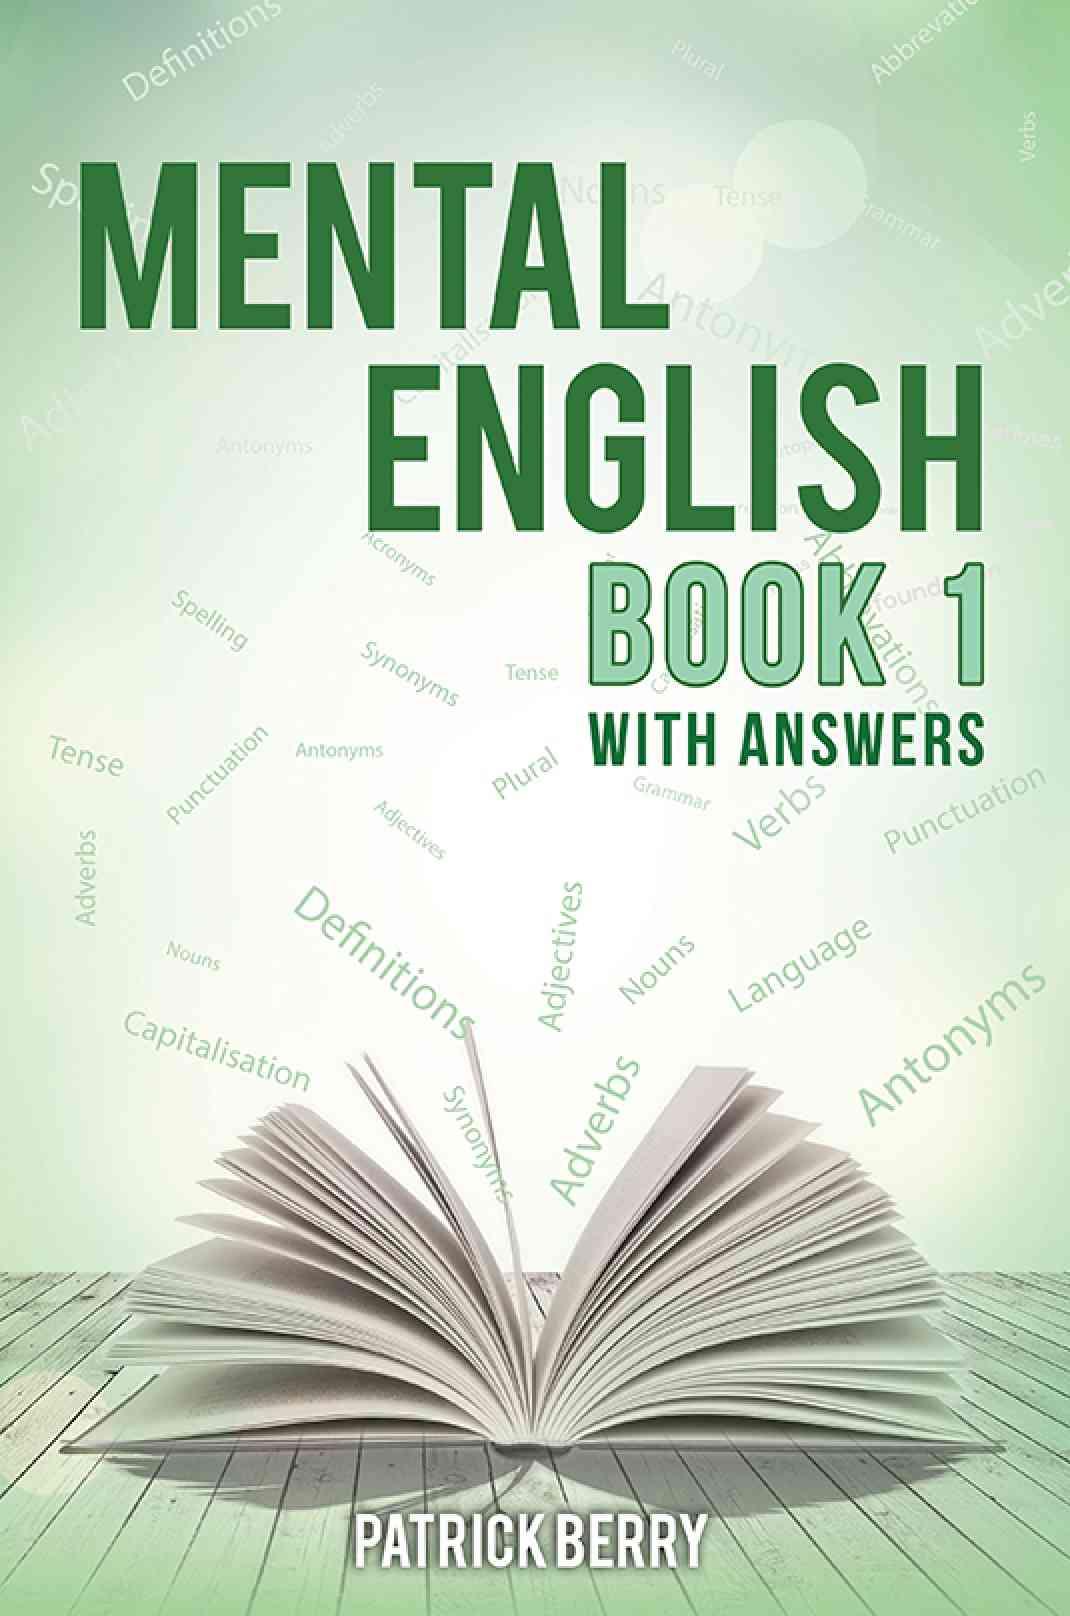 mental english book one book austin macauley publishers